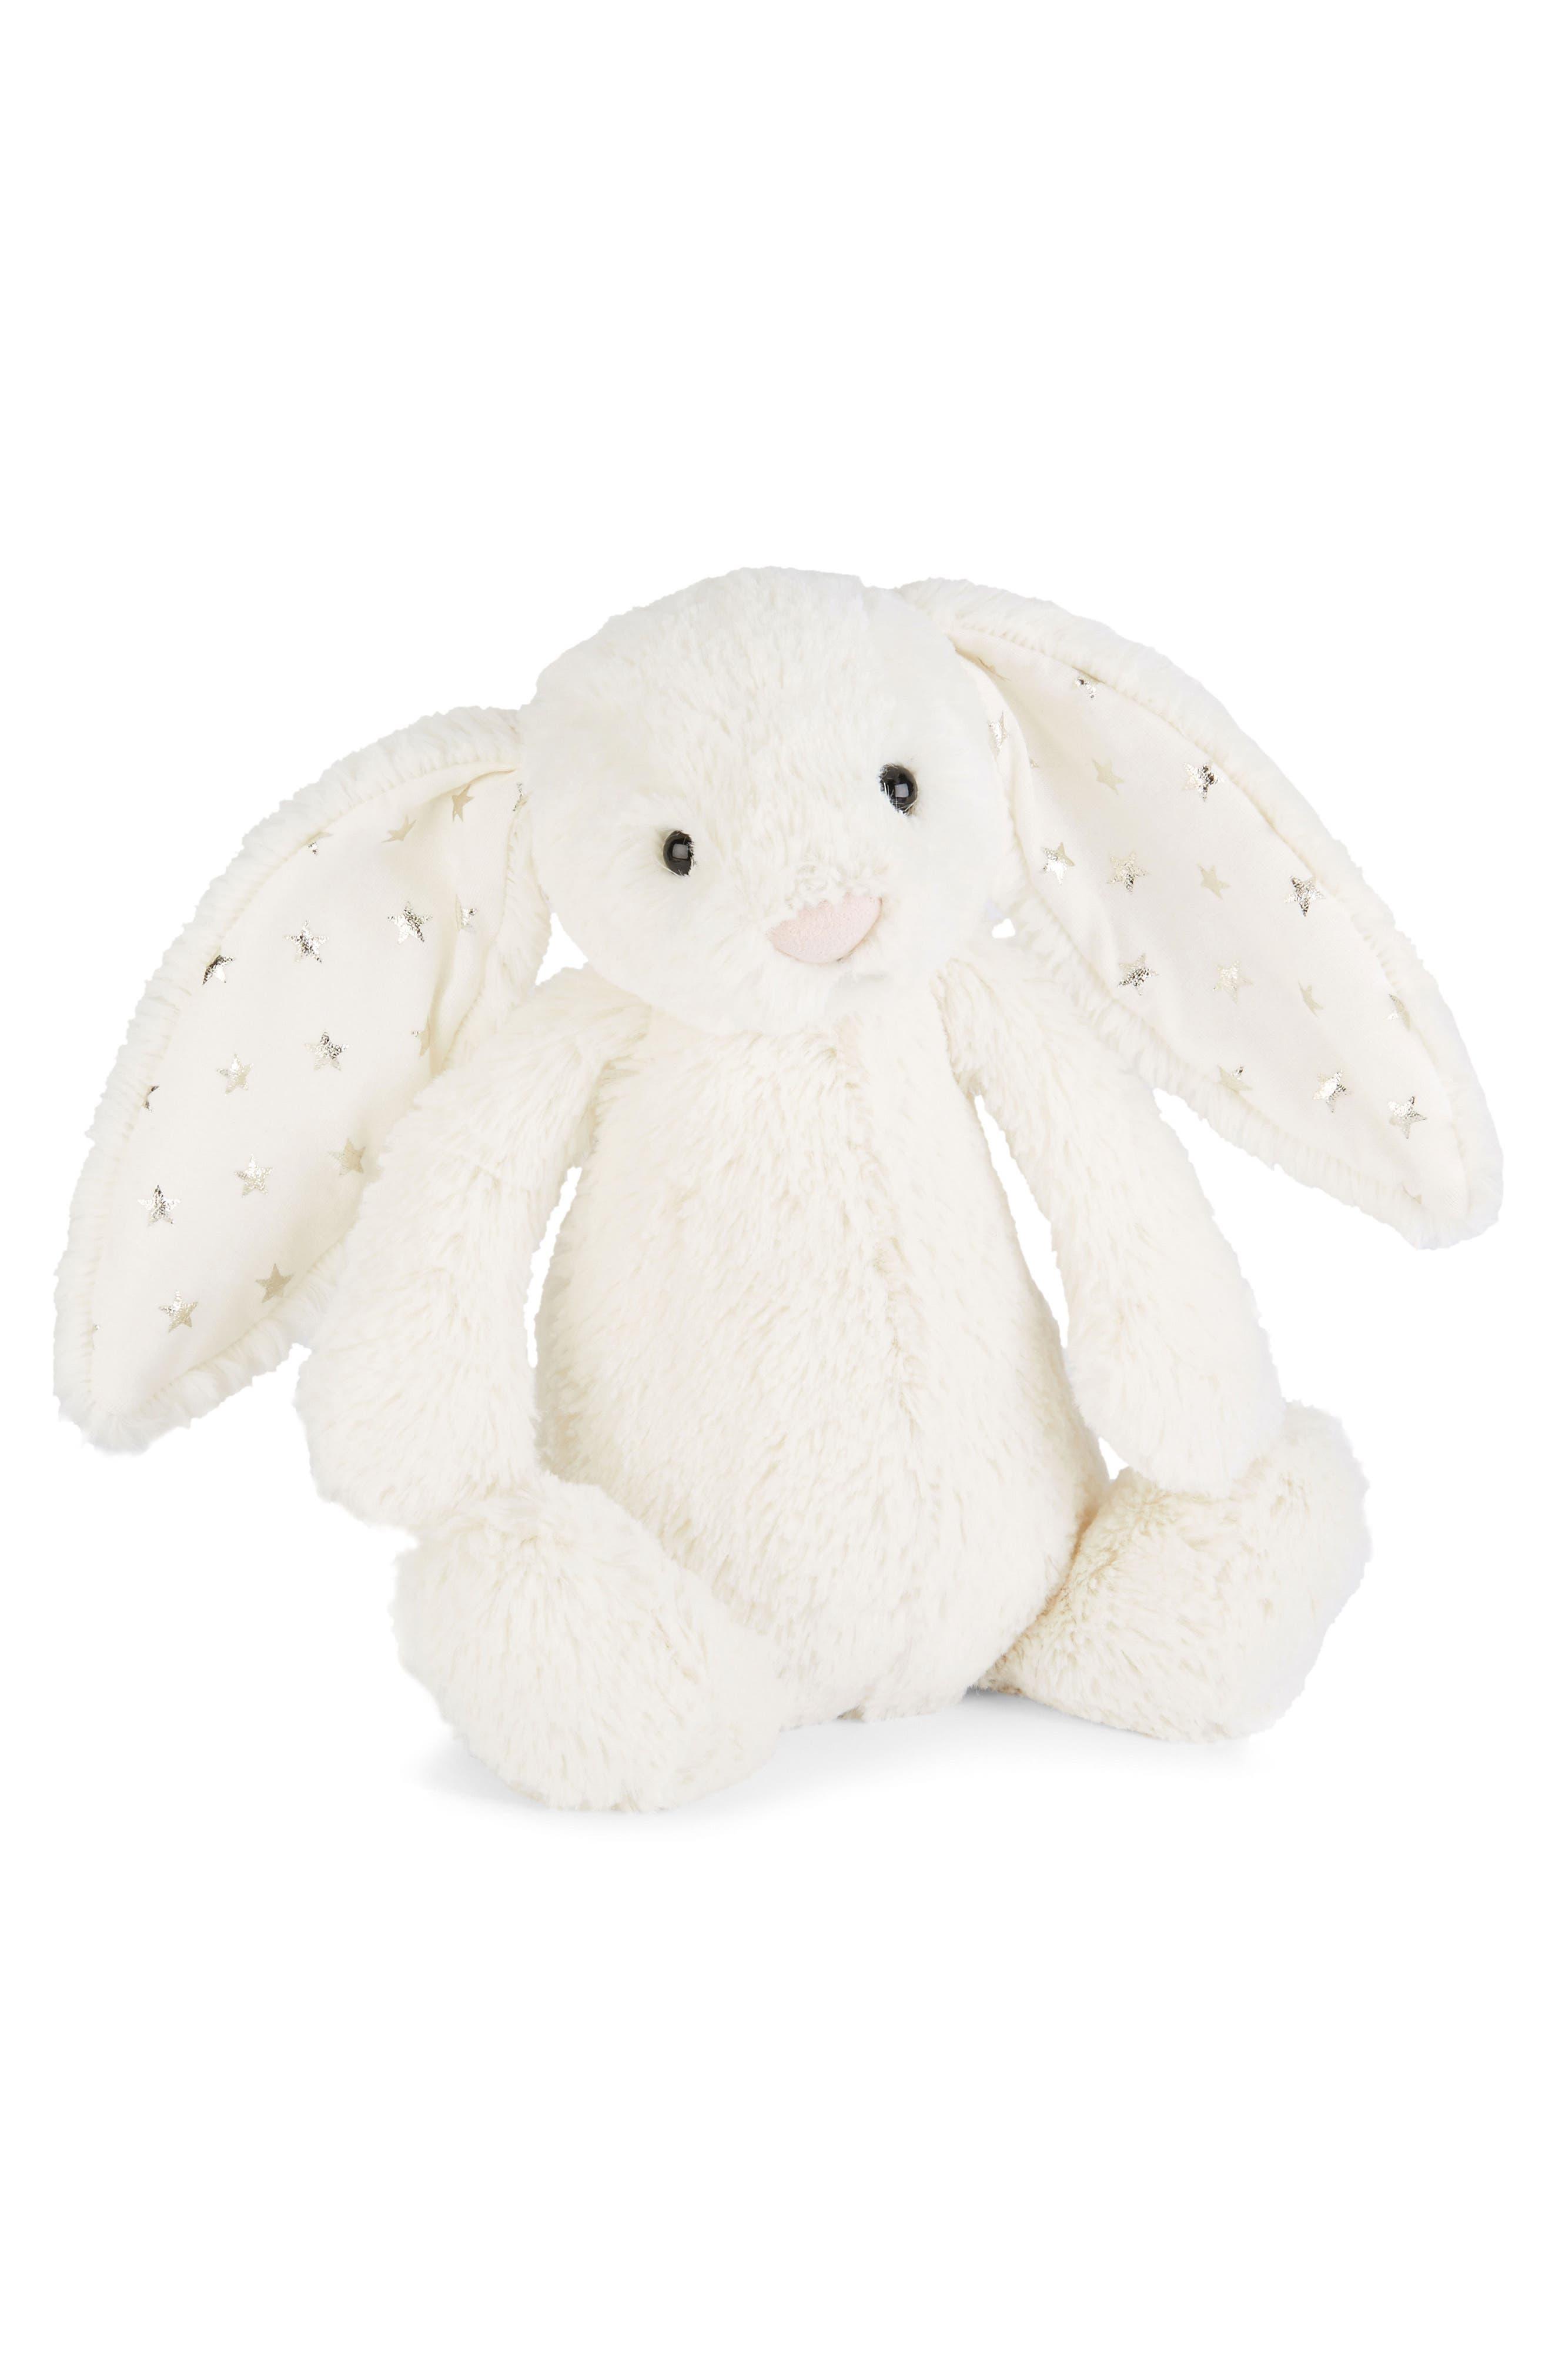 Main Image - Jellycat Twinkle Bunny Stuffed Animal